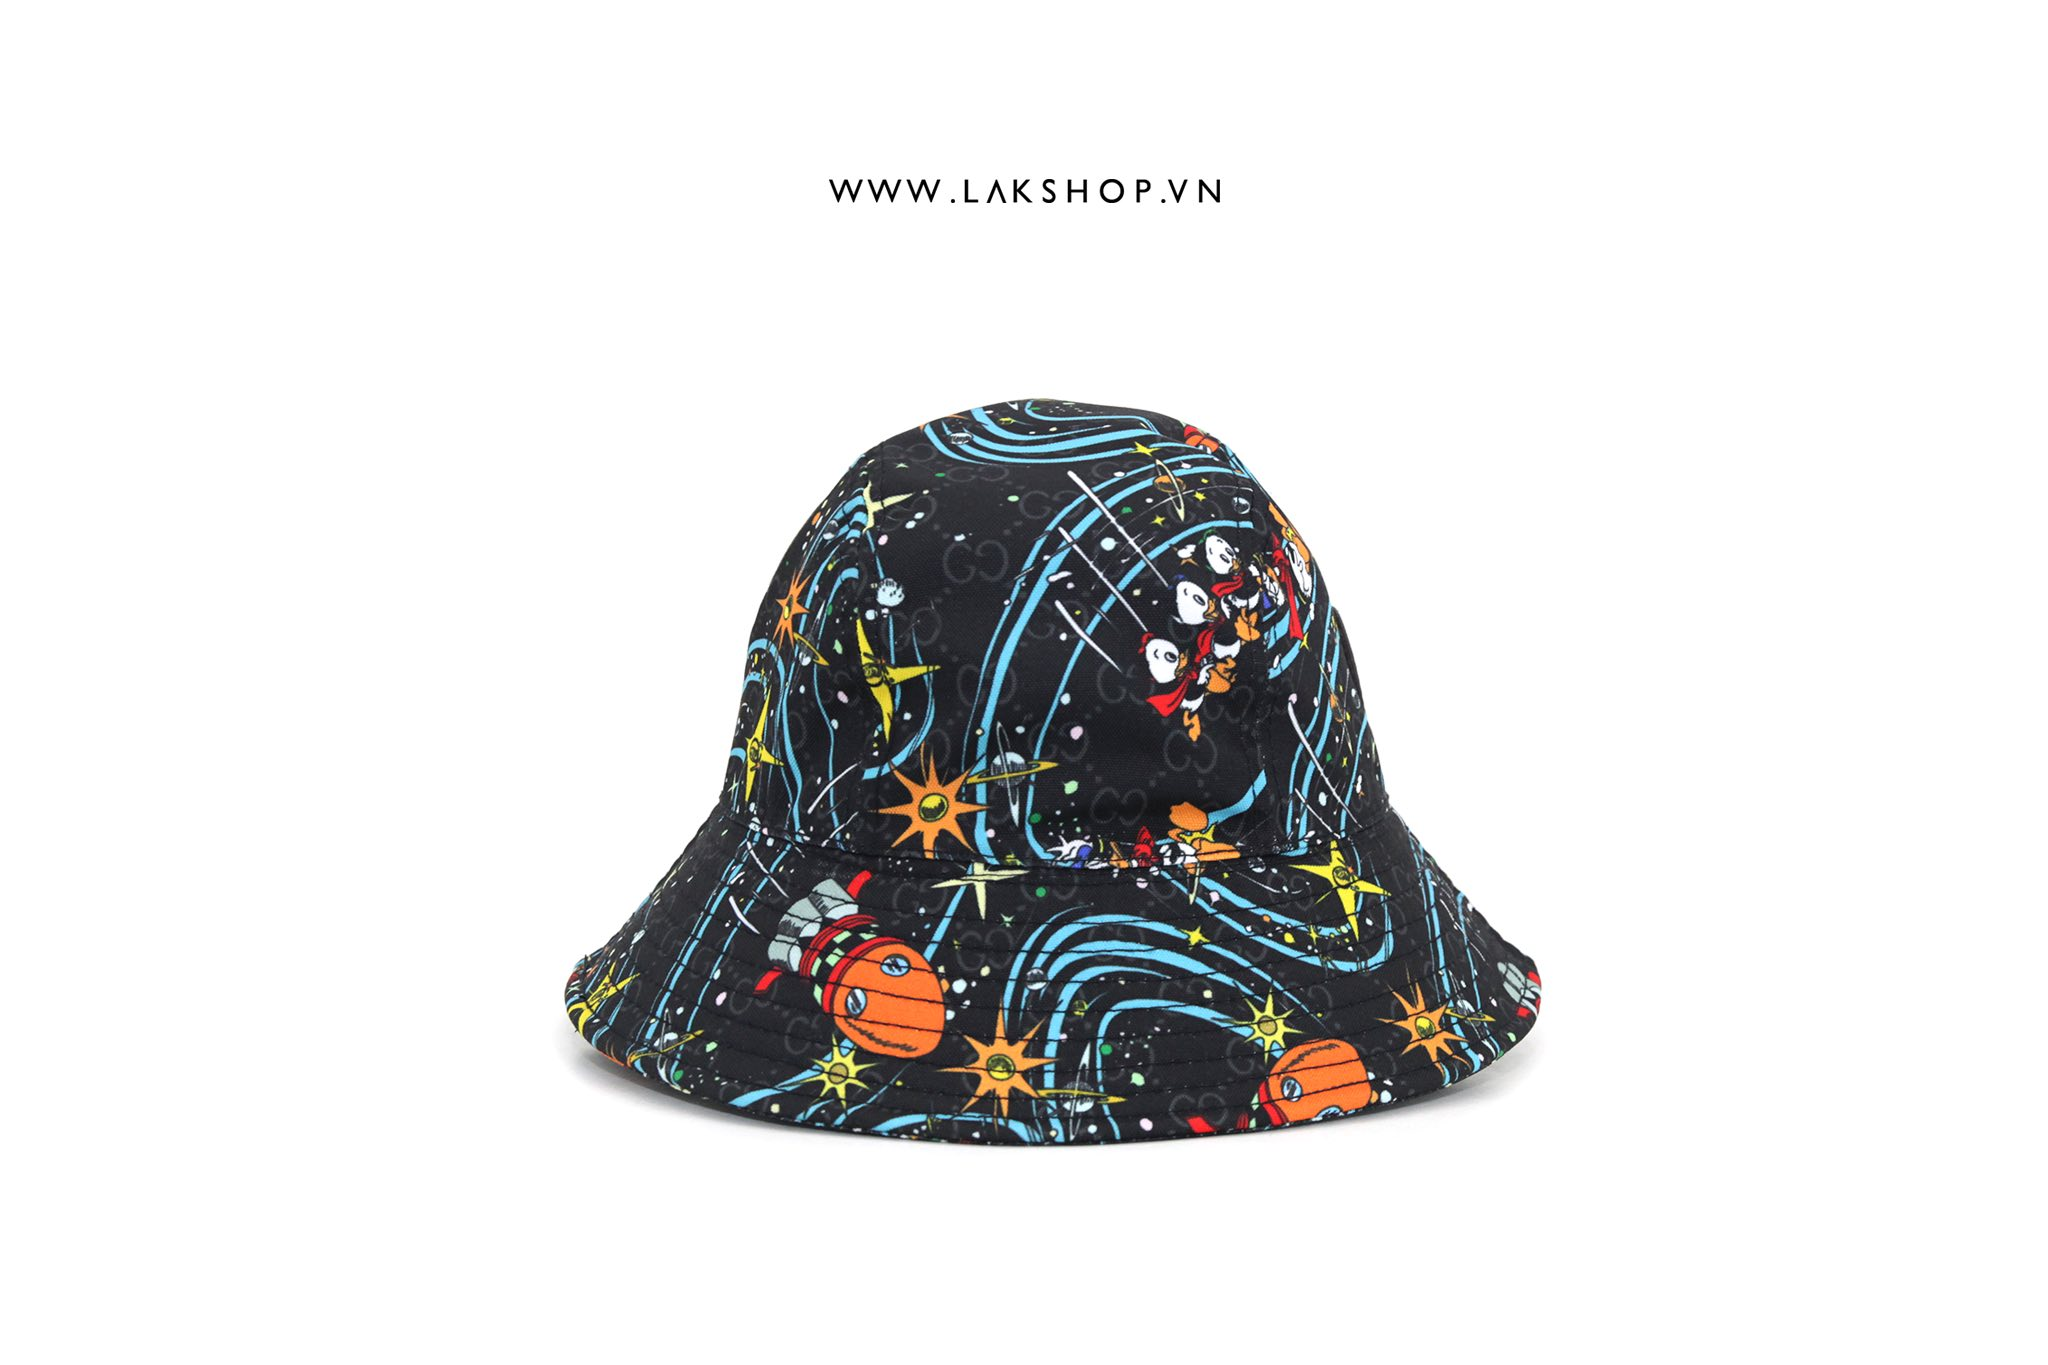 Gucci x Donald Duck Canvas Bucket Hat